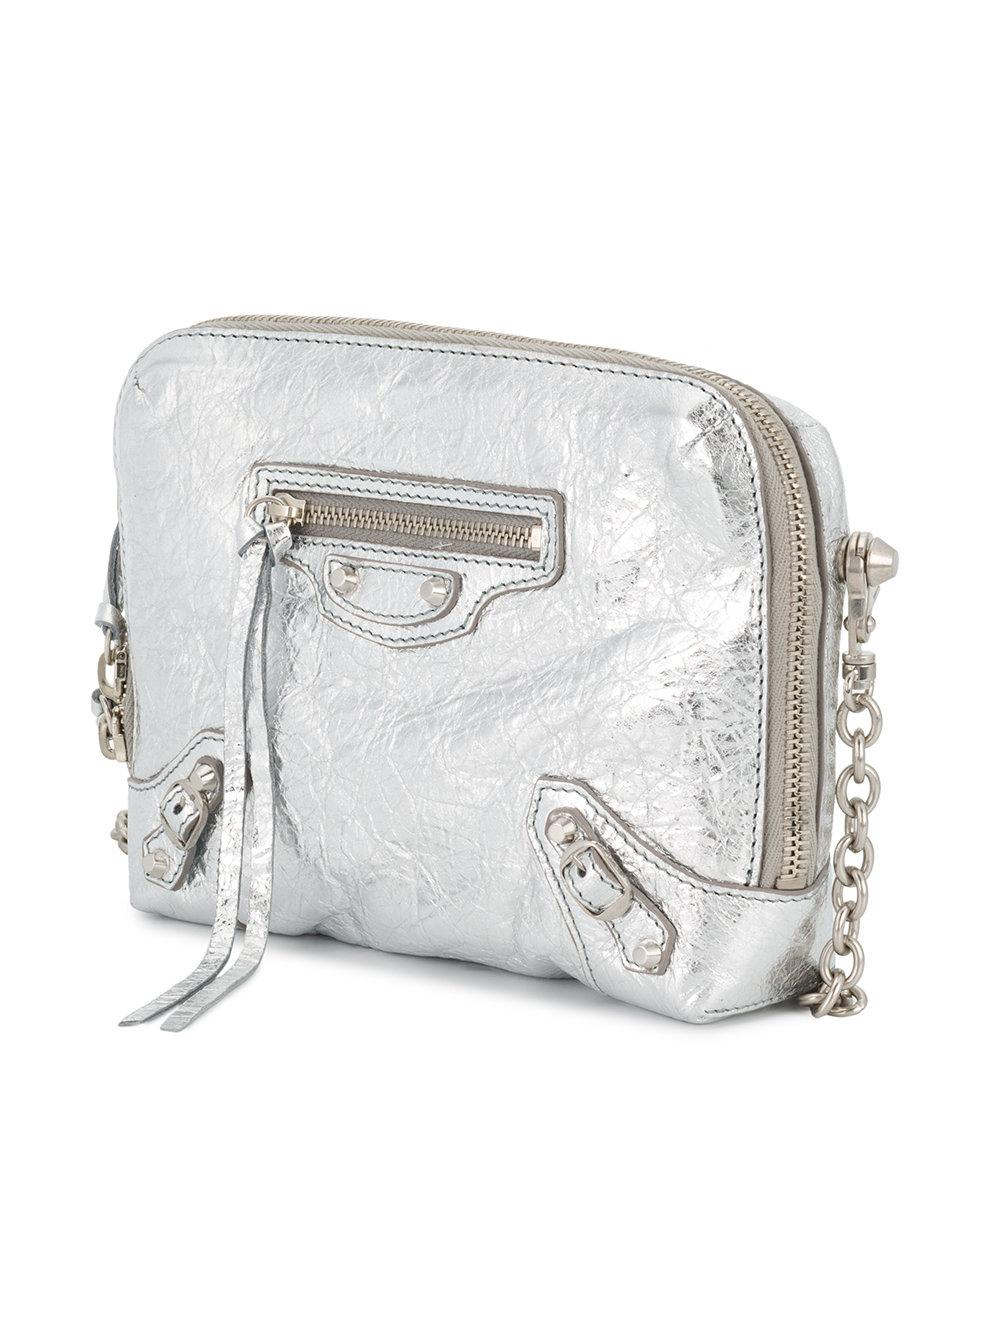 Balenciaga Leather Xs Reporter Crossbody Bag in Metallic